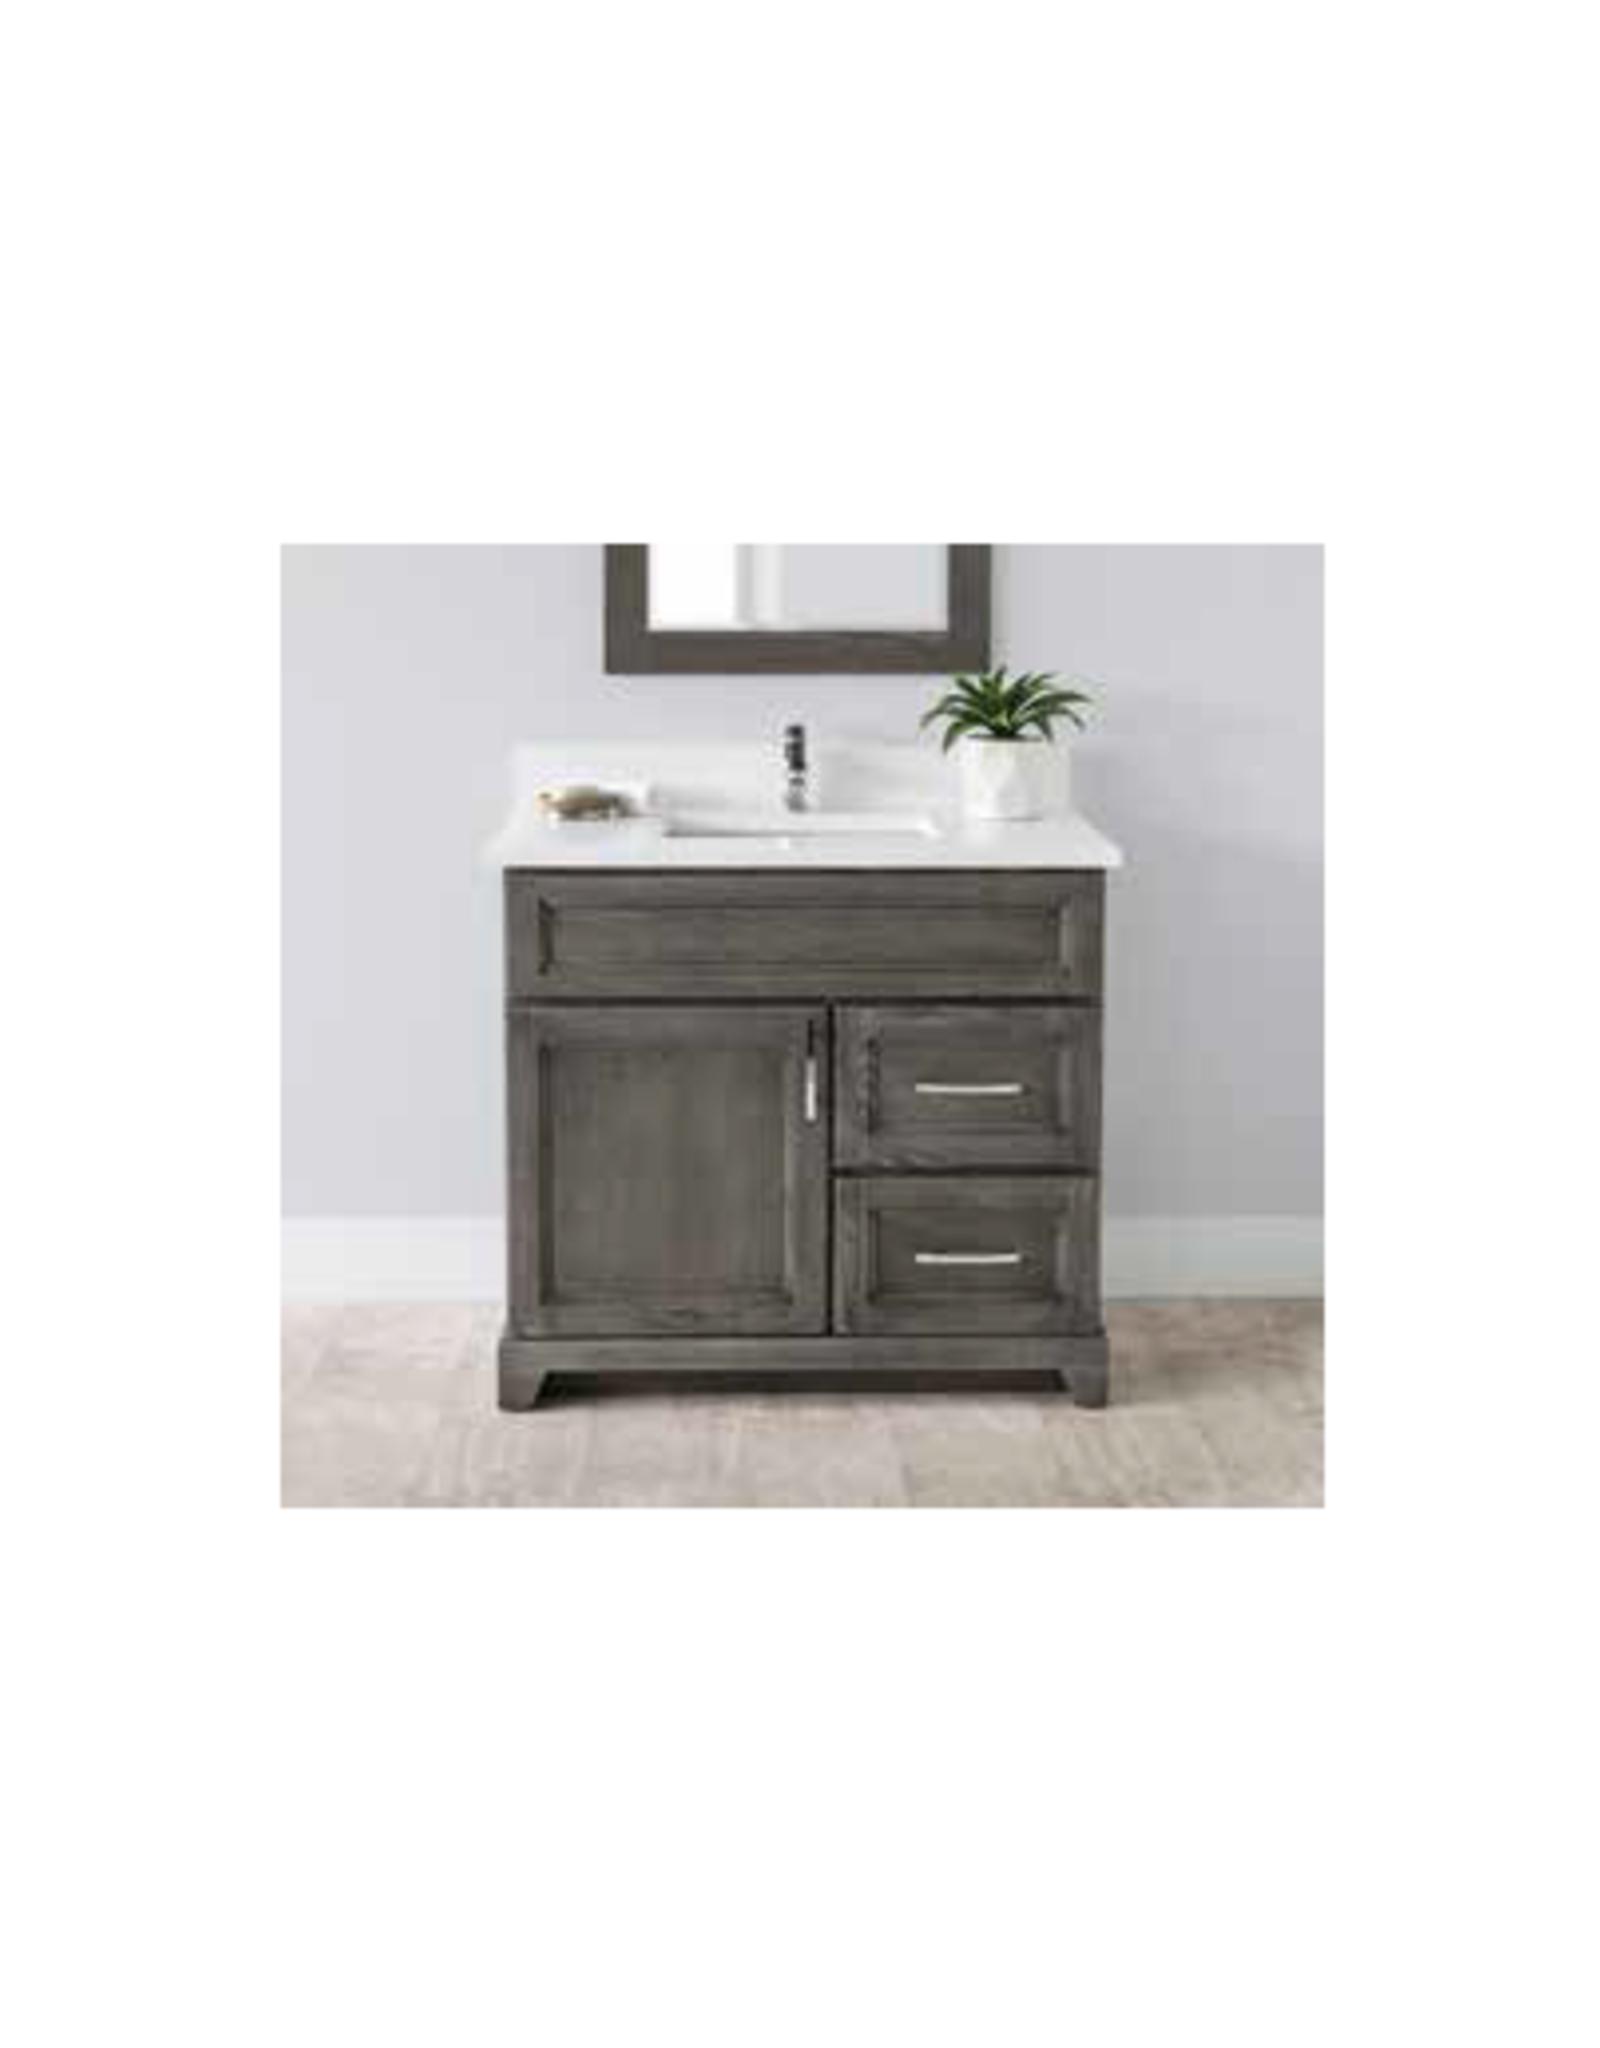 "Stonewood Premium 30"" Vanity, Top and Sink"